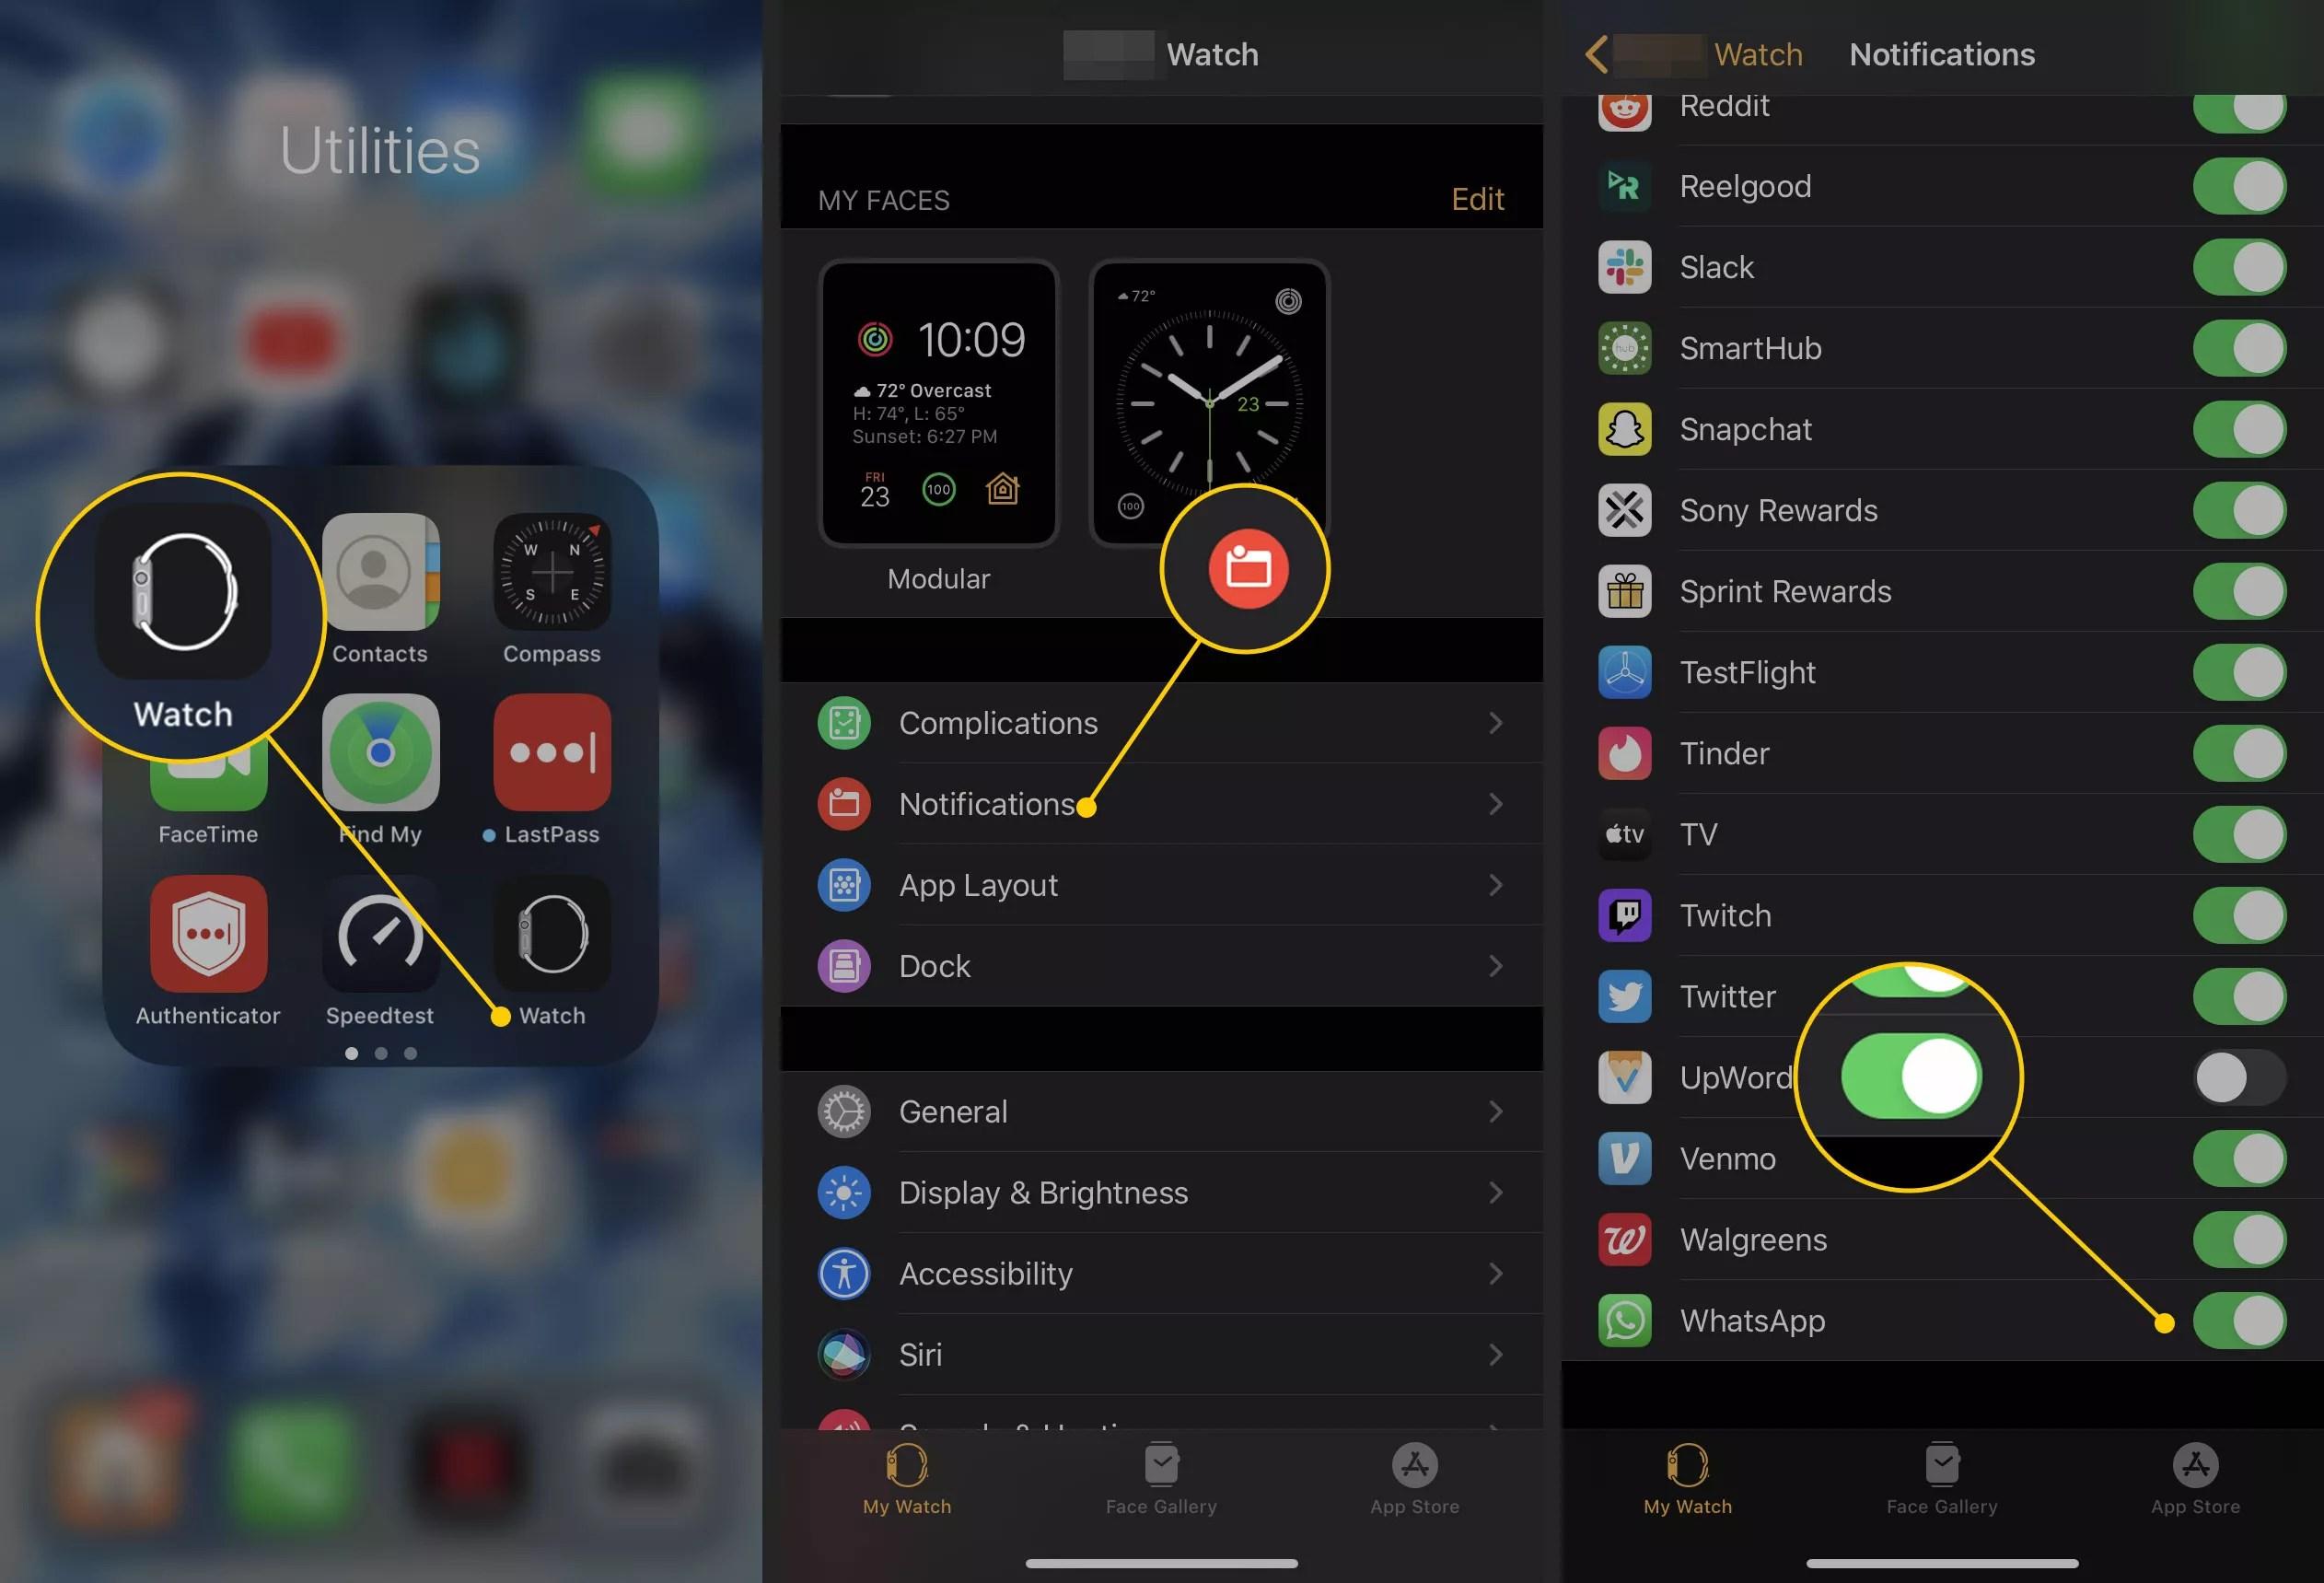 Notification settings in the iOS Watch app